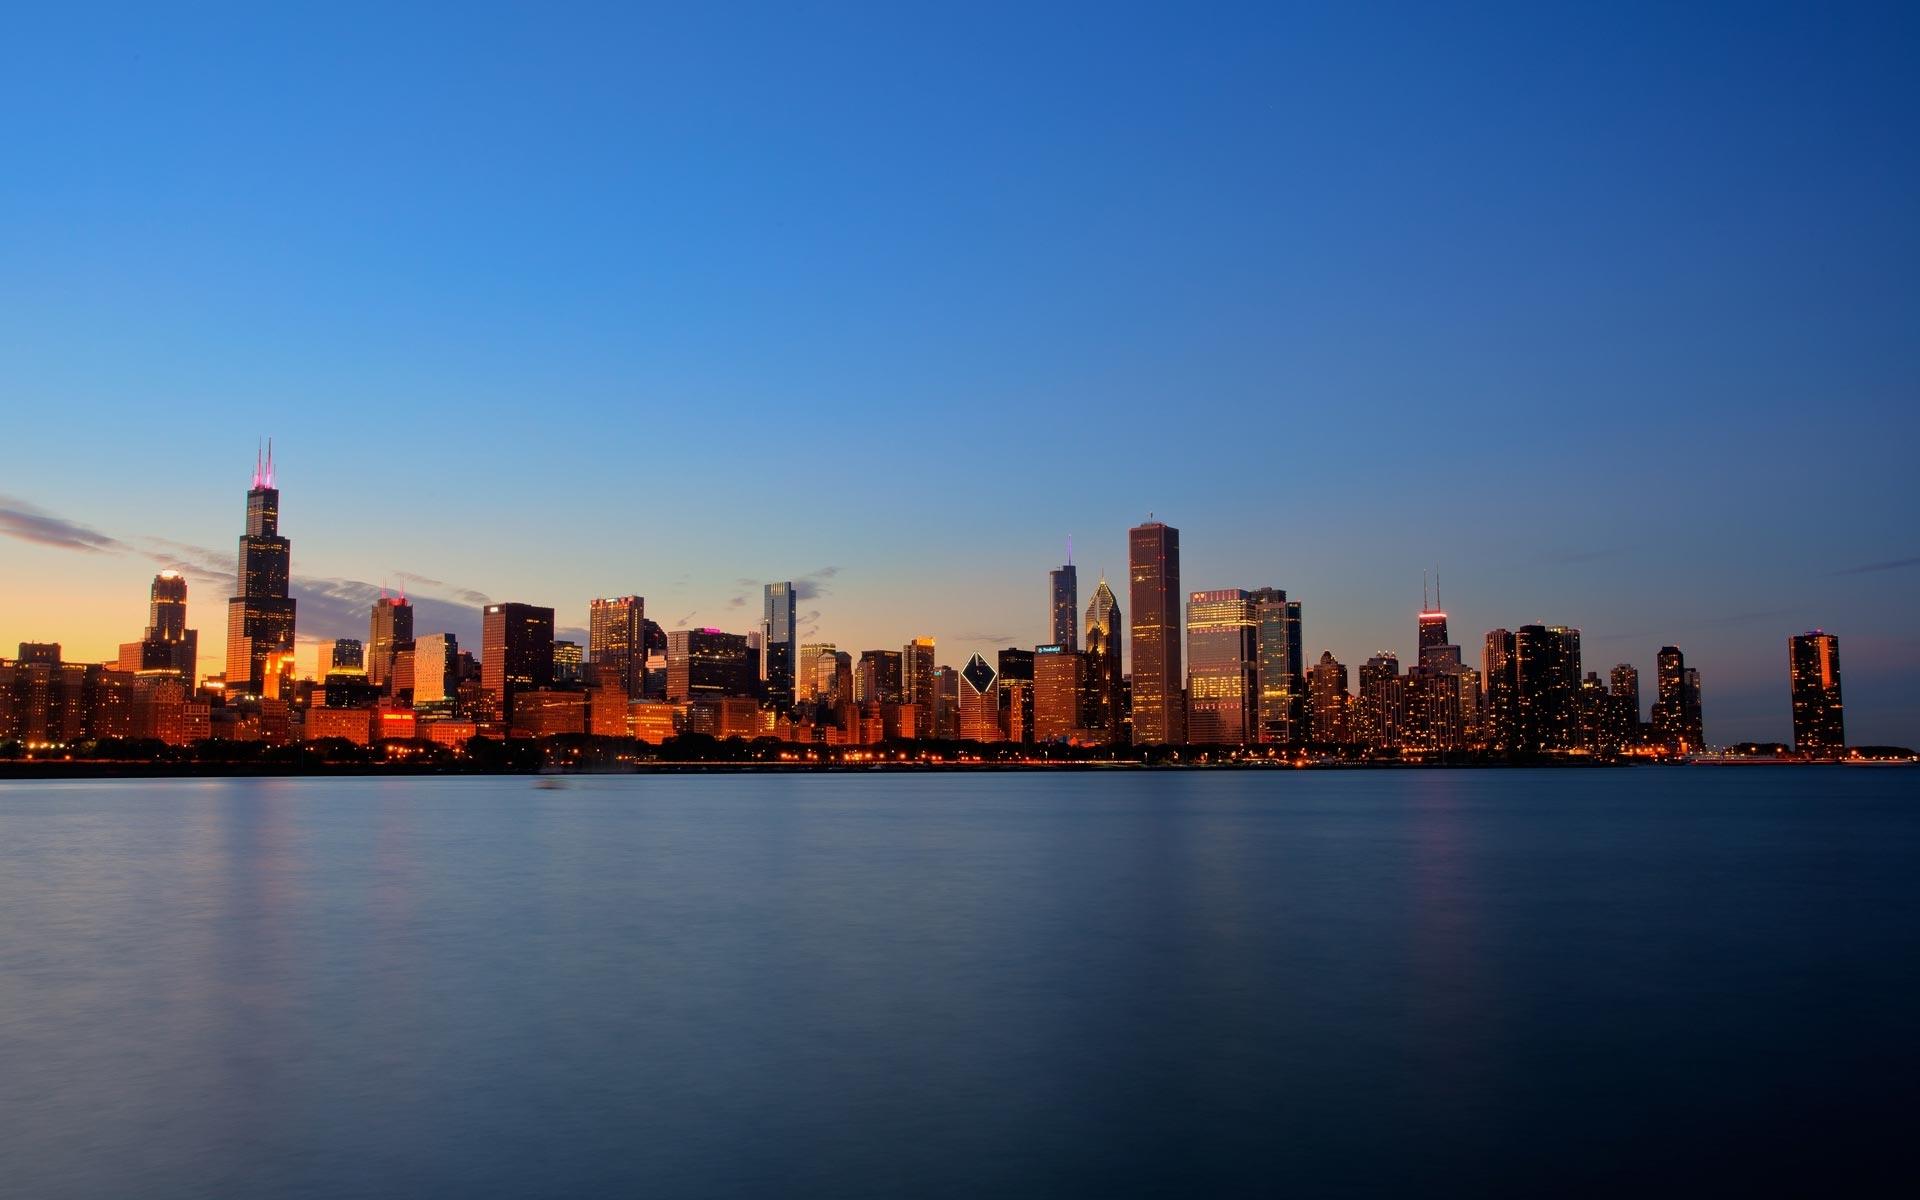 chicago skyline at night hd | chicago night skyline hd wallpaper